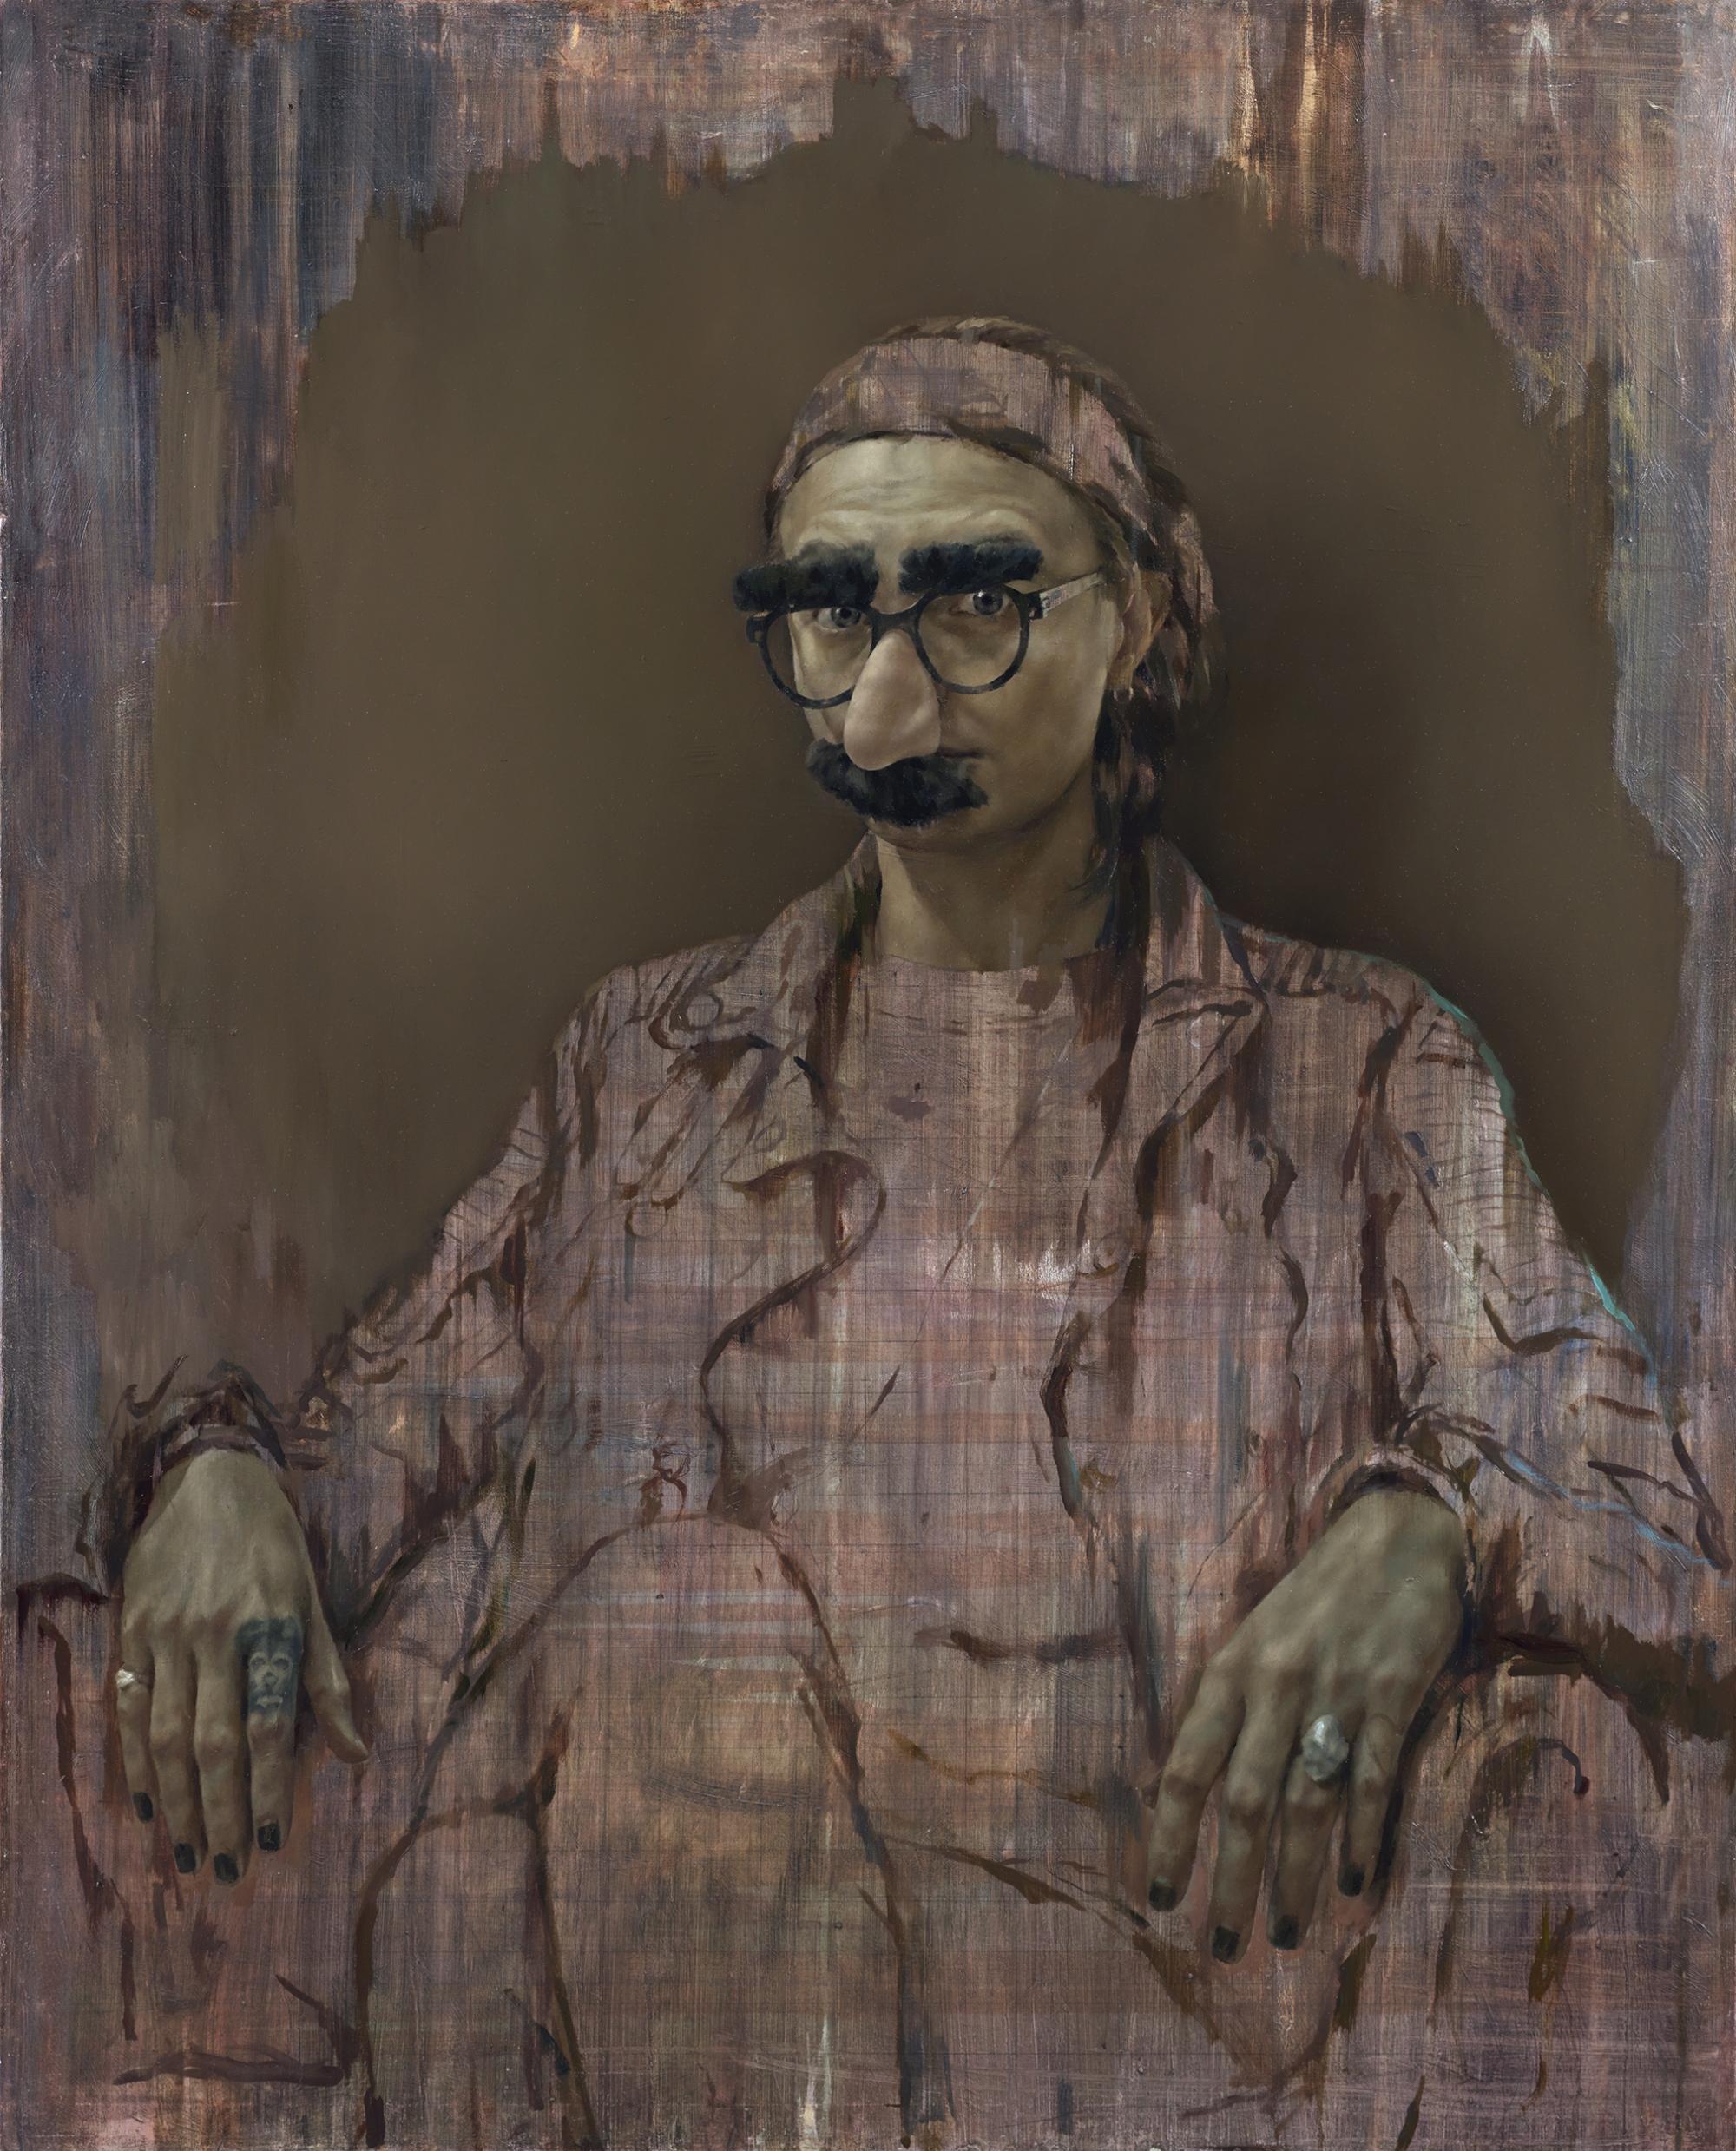 Cara_VII_(Groucho)_2000_2478_s.jpg